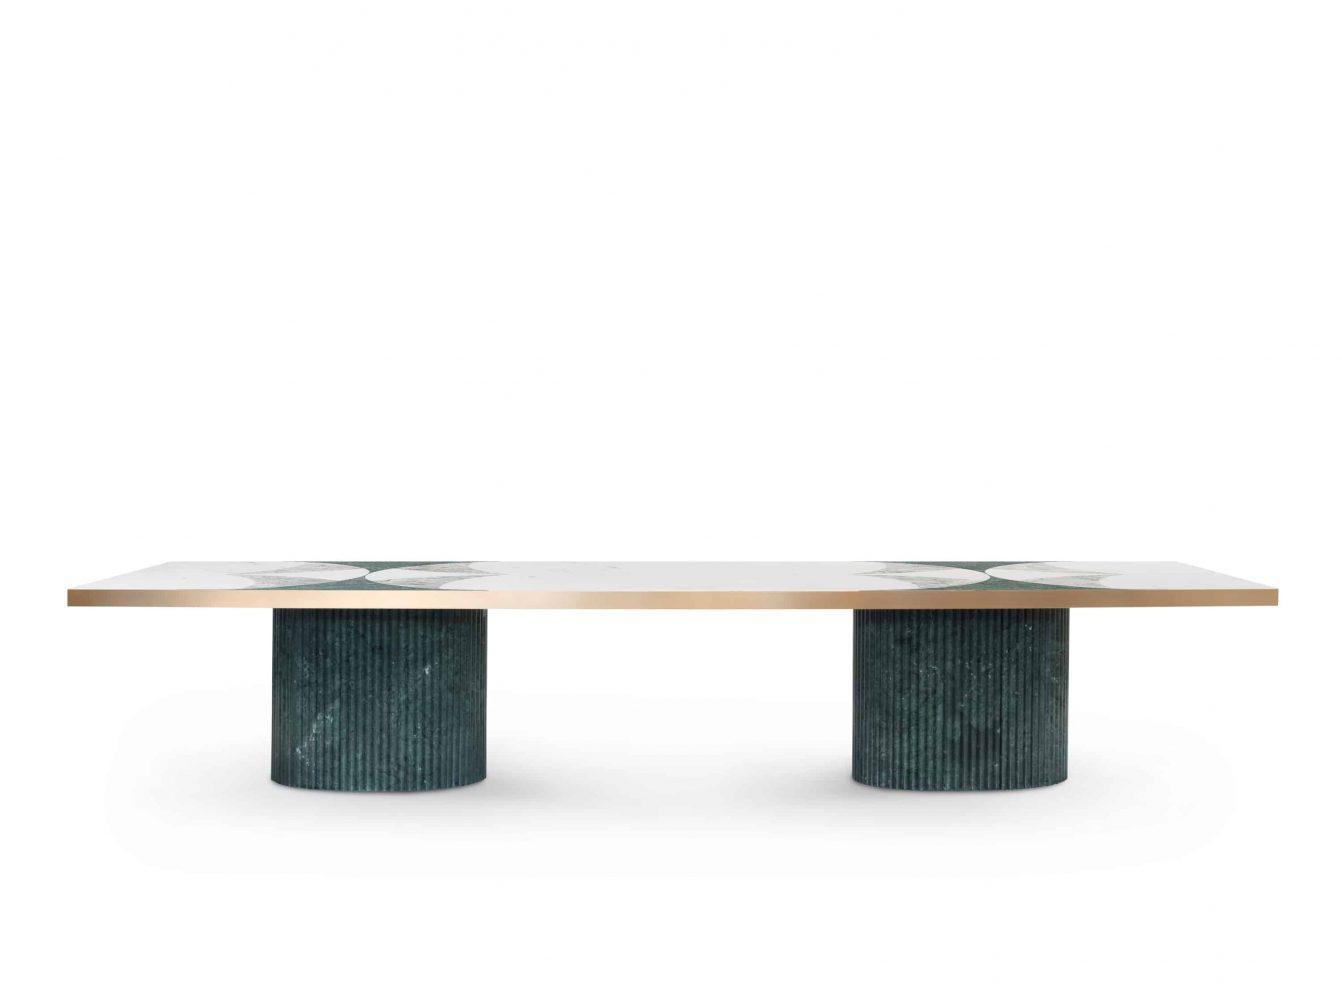 Biloba-G703220-Dining-Table-S-01